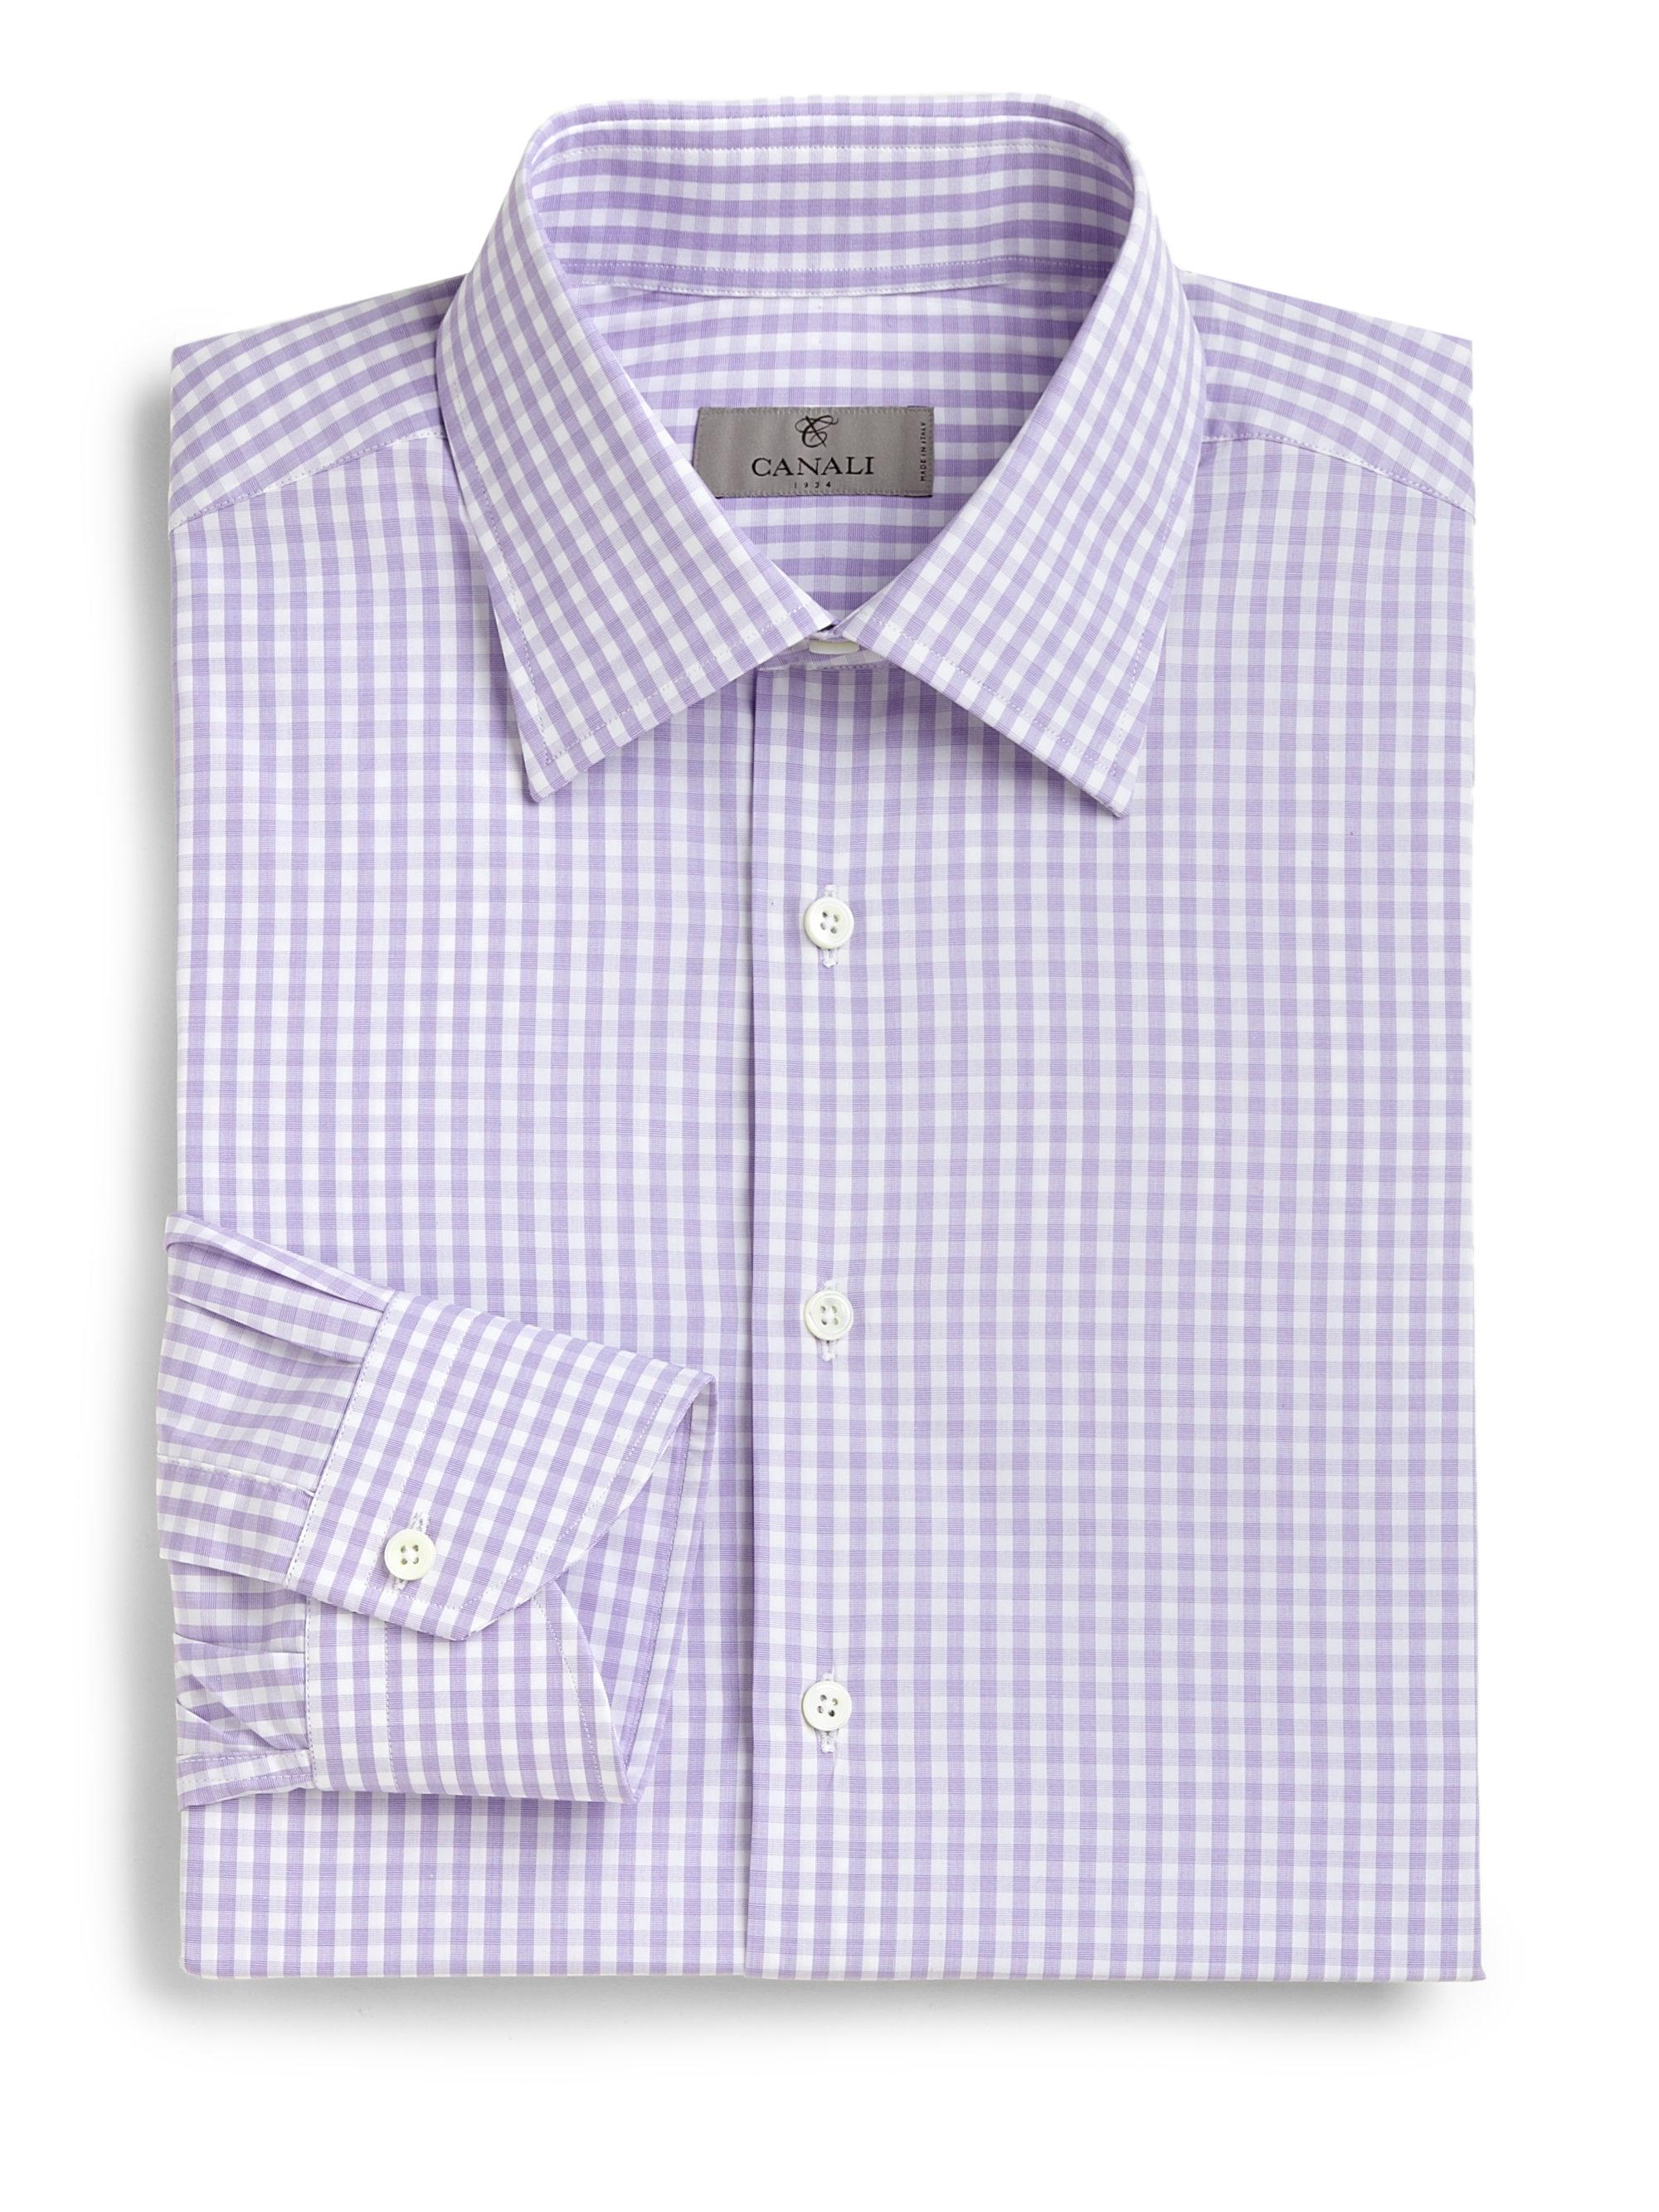 82ae0d0ec43 Canali Regular-Fit Gingham Dress Shirt in Purple for Men - Lyst